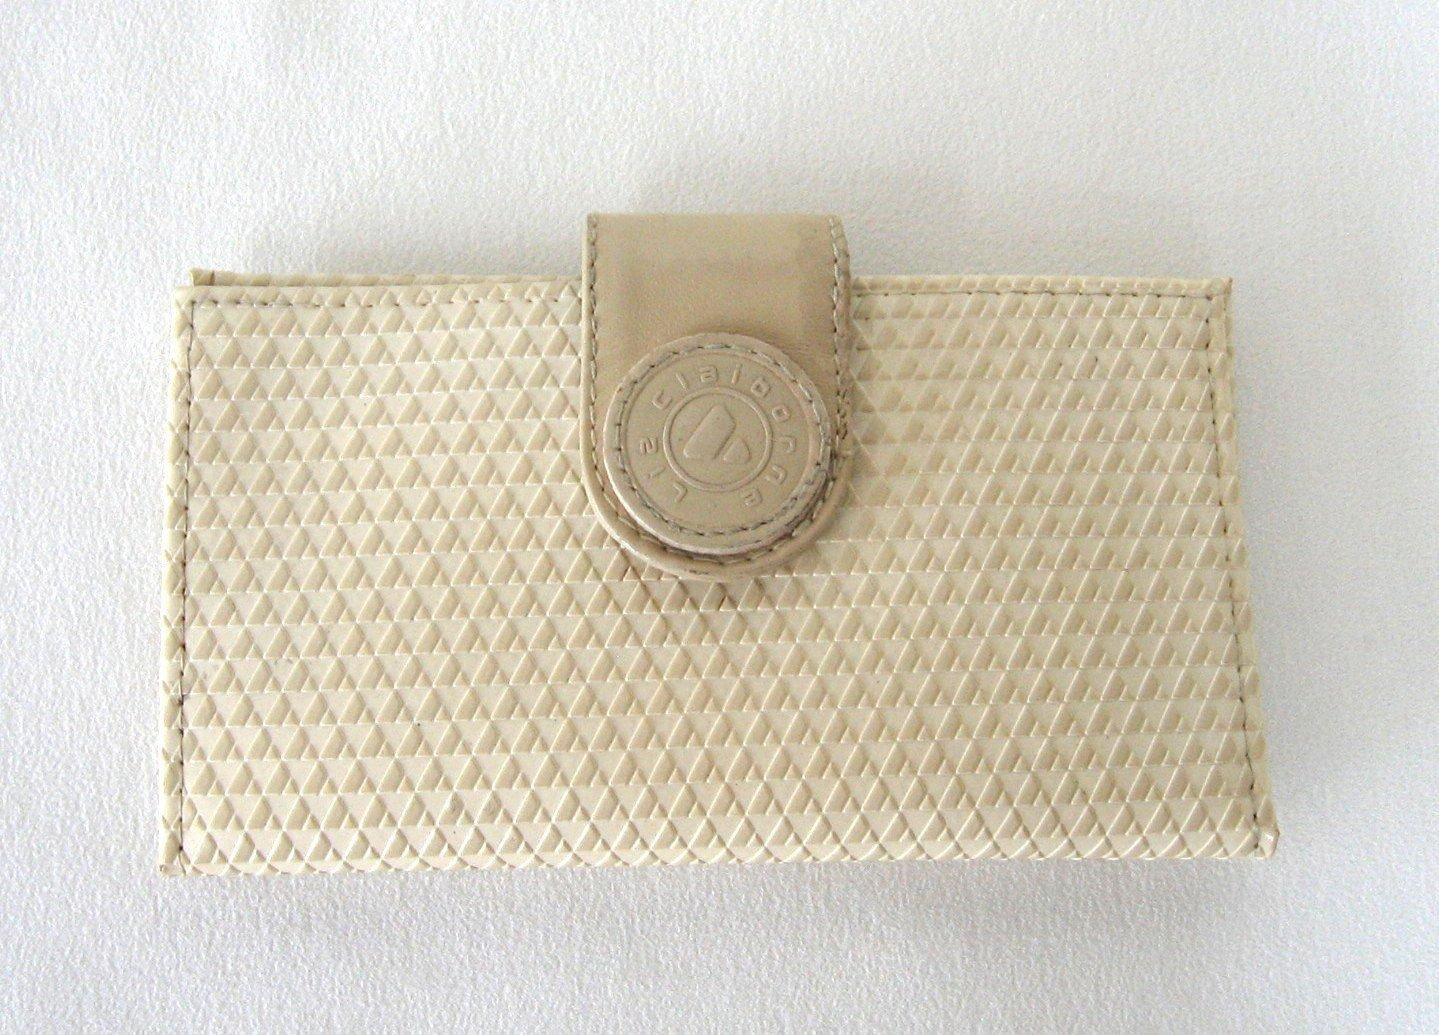 Liz Claiborne Designer Wallet Tan Beige Leather Trim Vintage